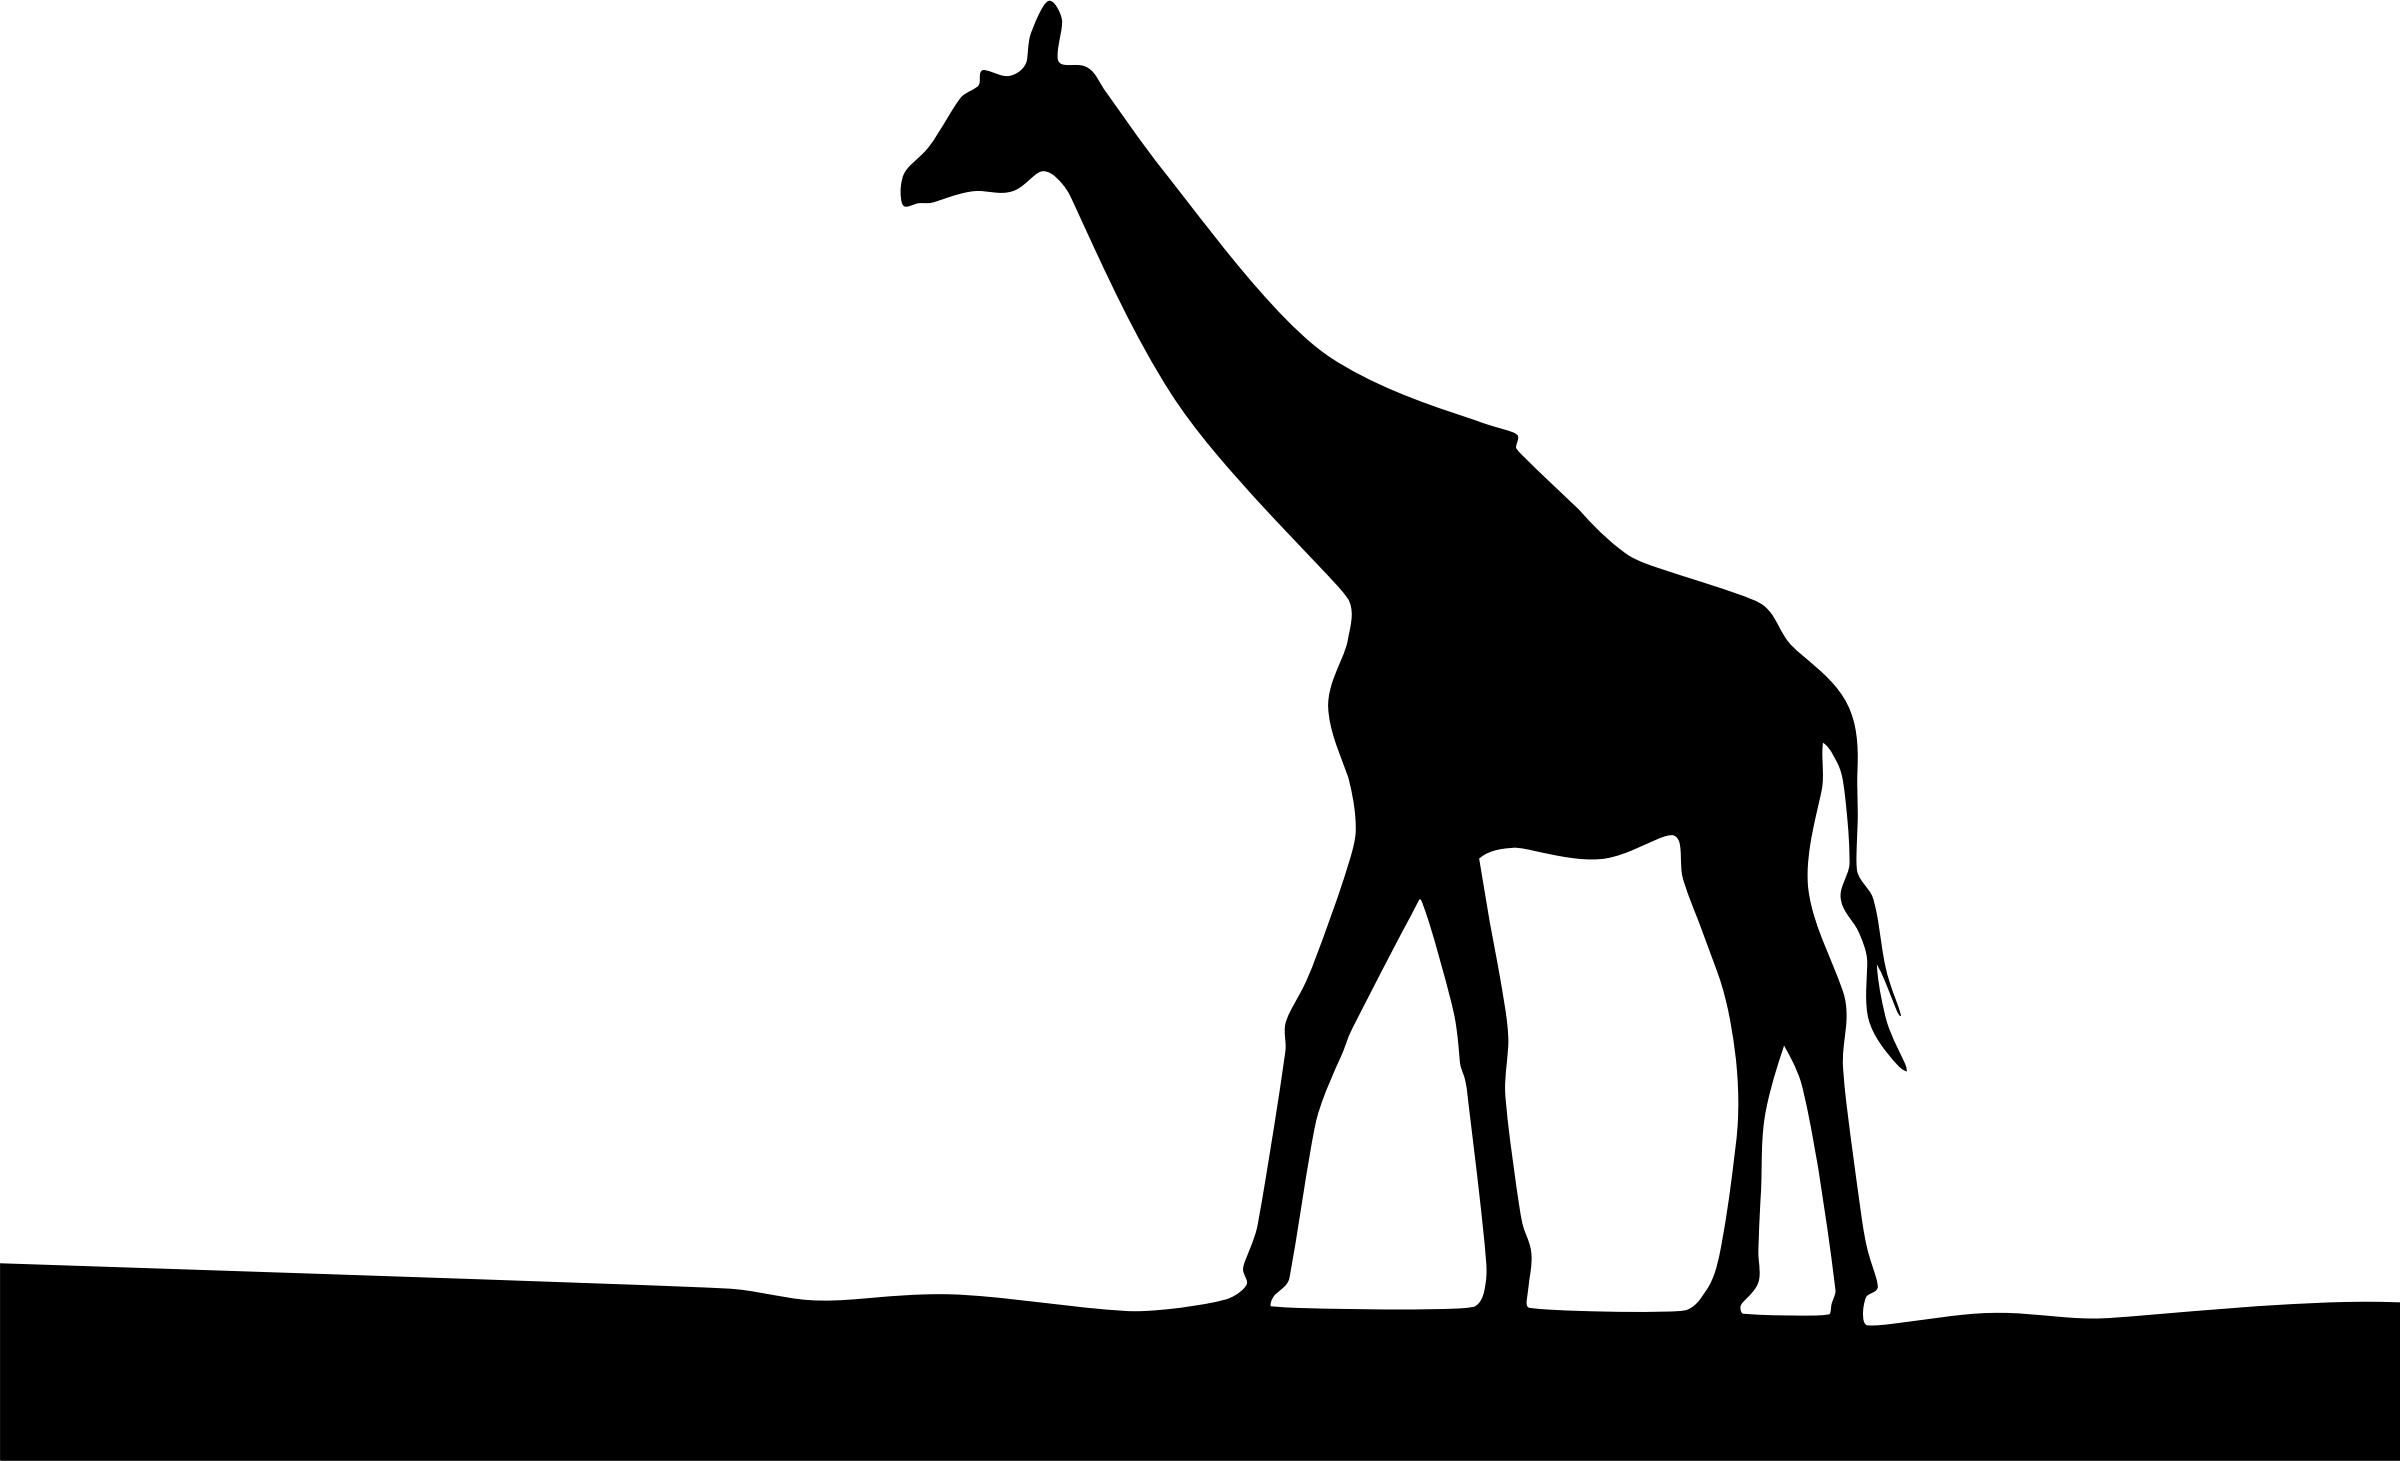 Shocking giraffe landscape silhouette. Clipart bathroom modern bathroom